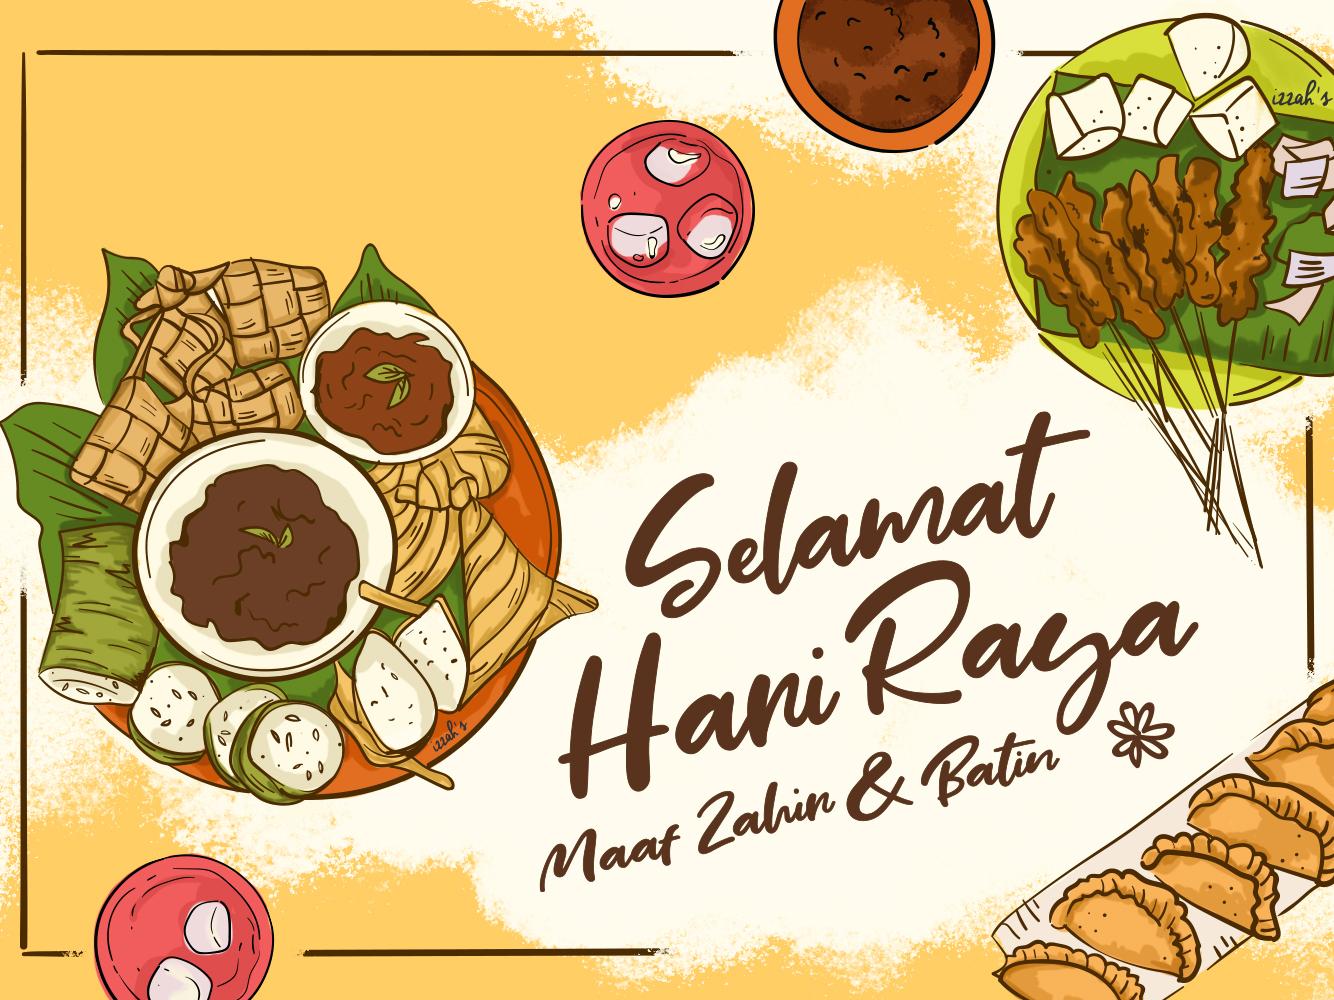 Makan-makan Raya raya eid brush drawings illustrations design